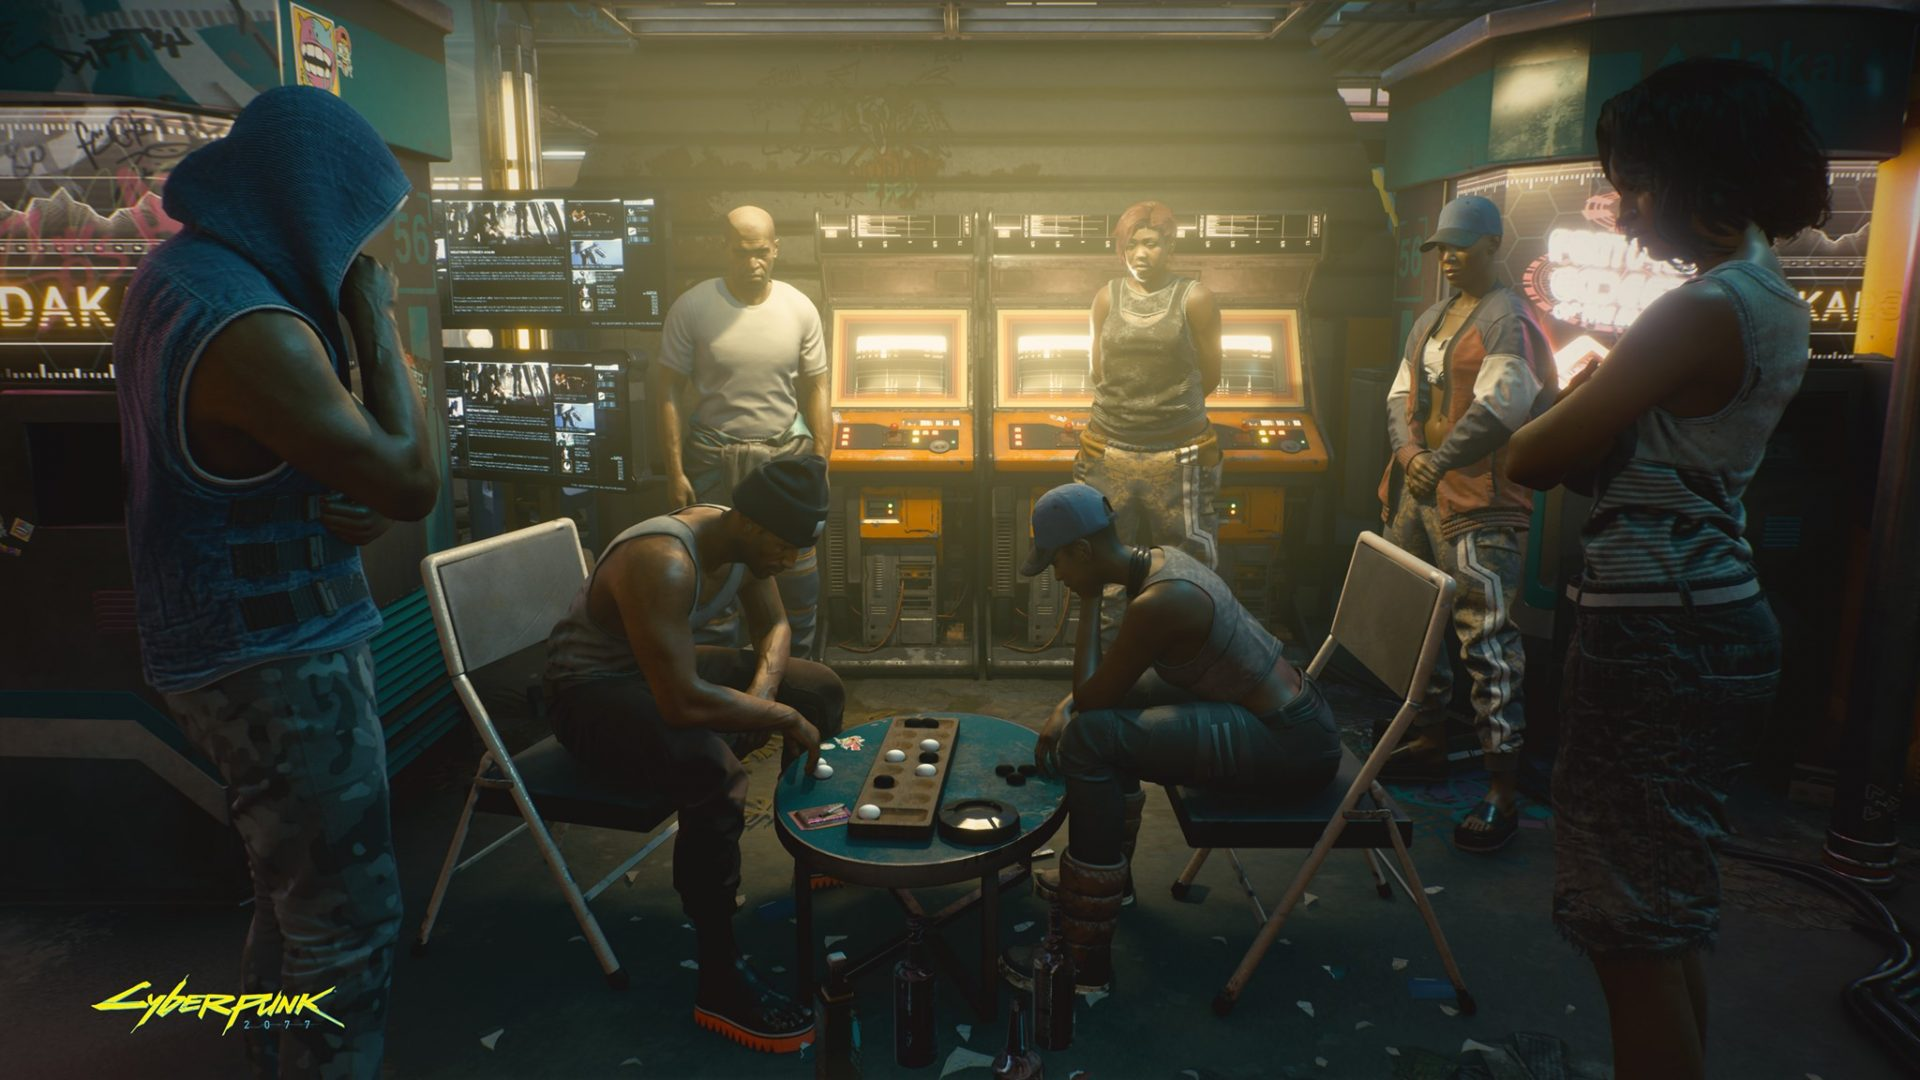 New beautiful Gamescom 2019 screenshots released for Cyberpunk 2077 – DSOGaming